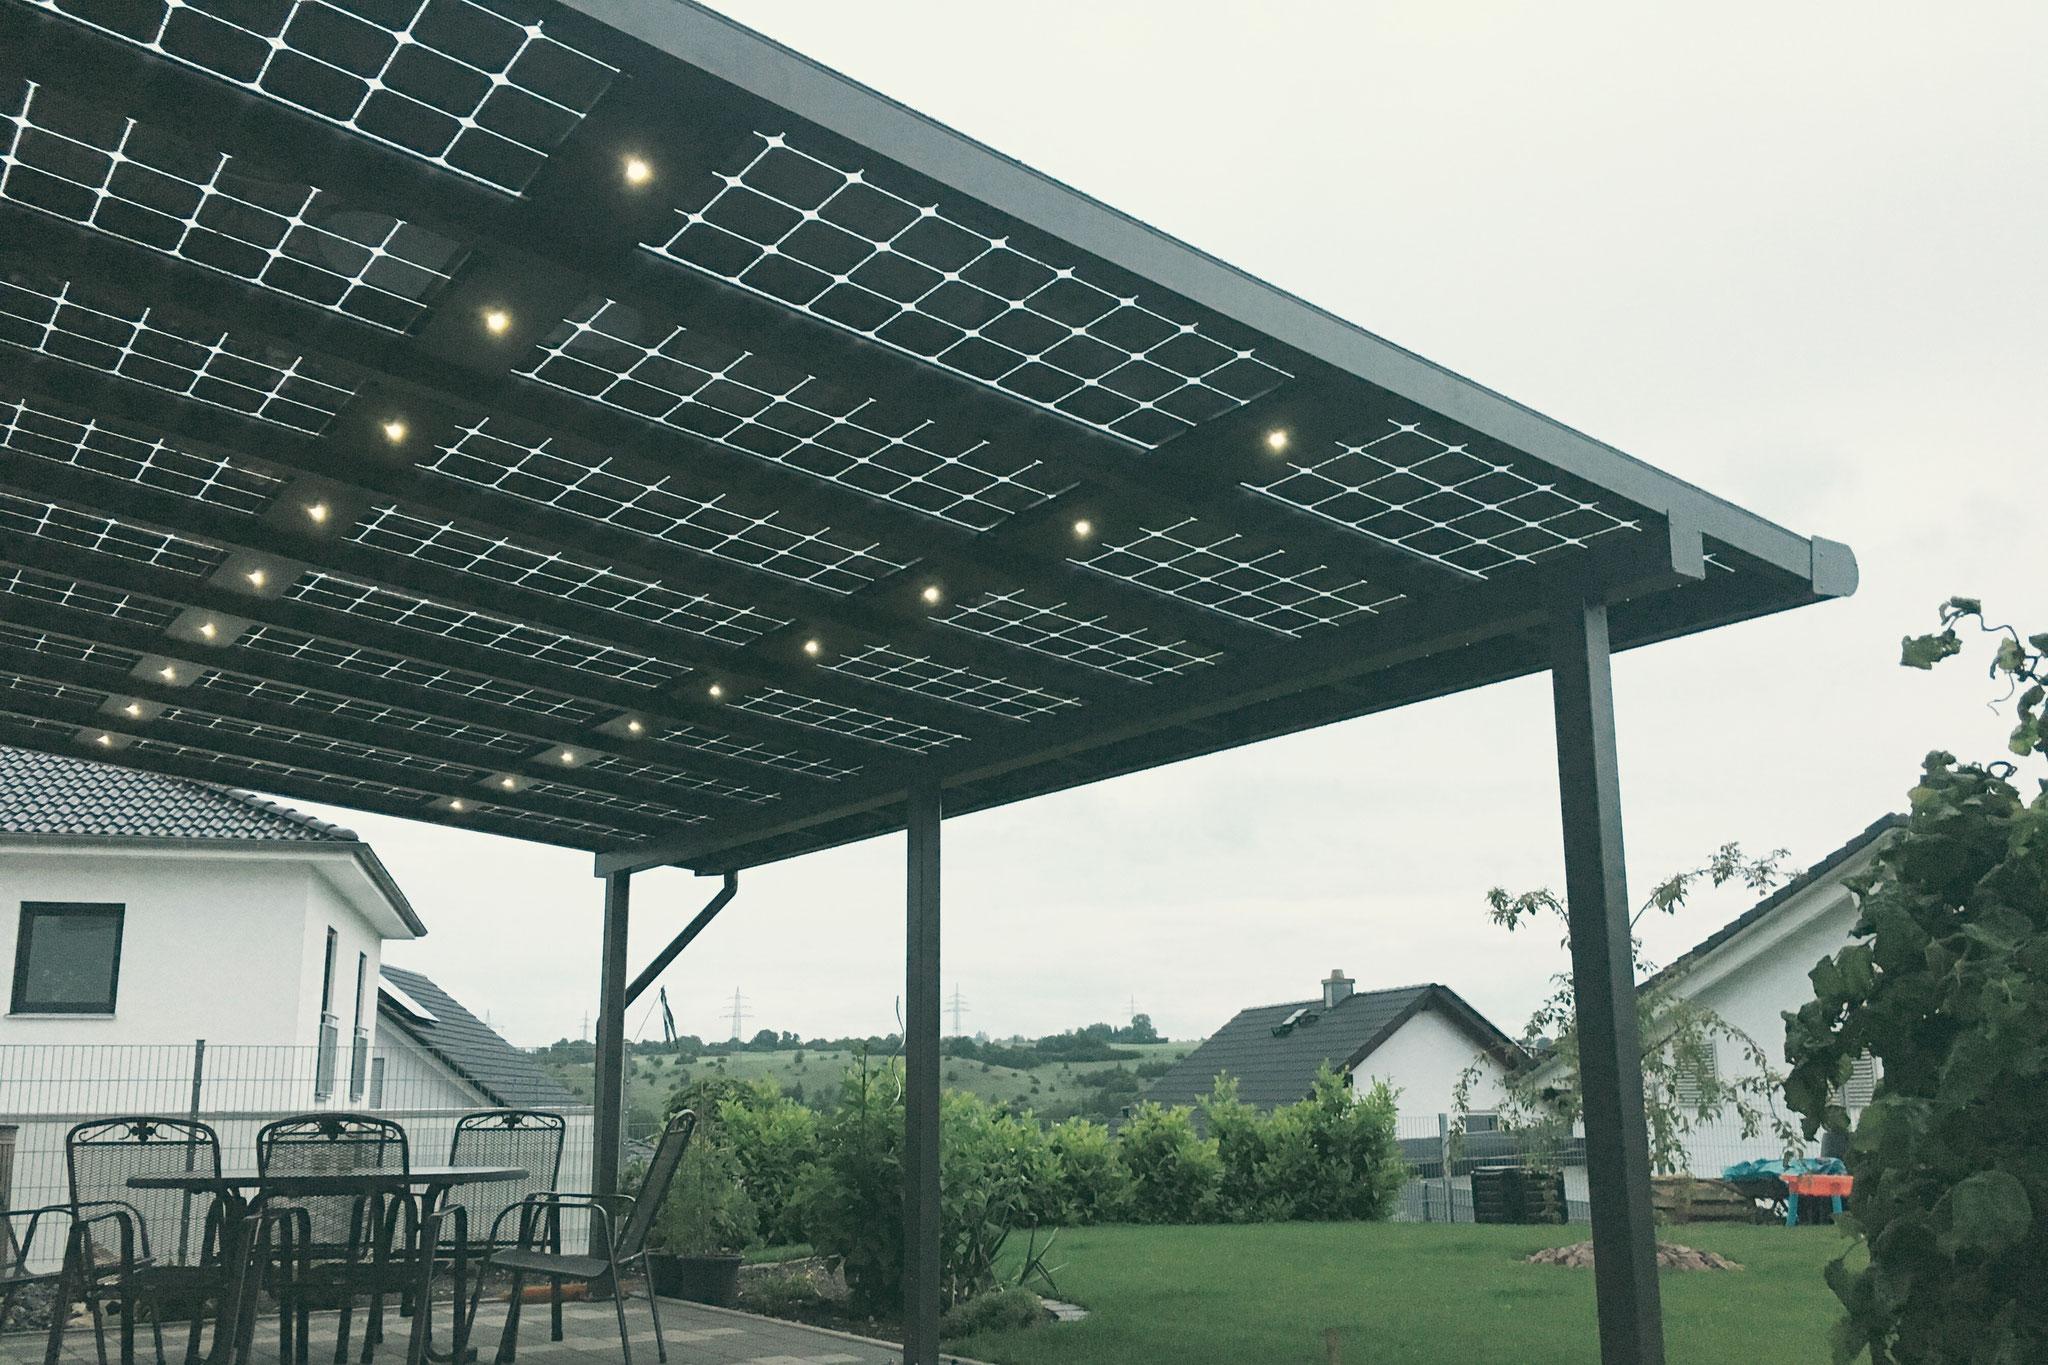 Canopy roof lighting